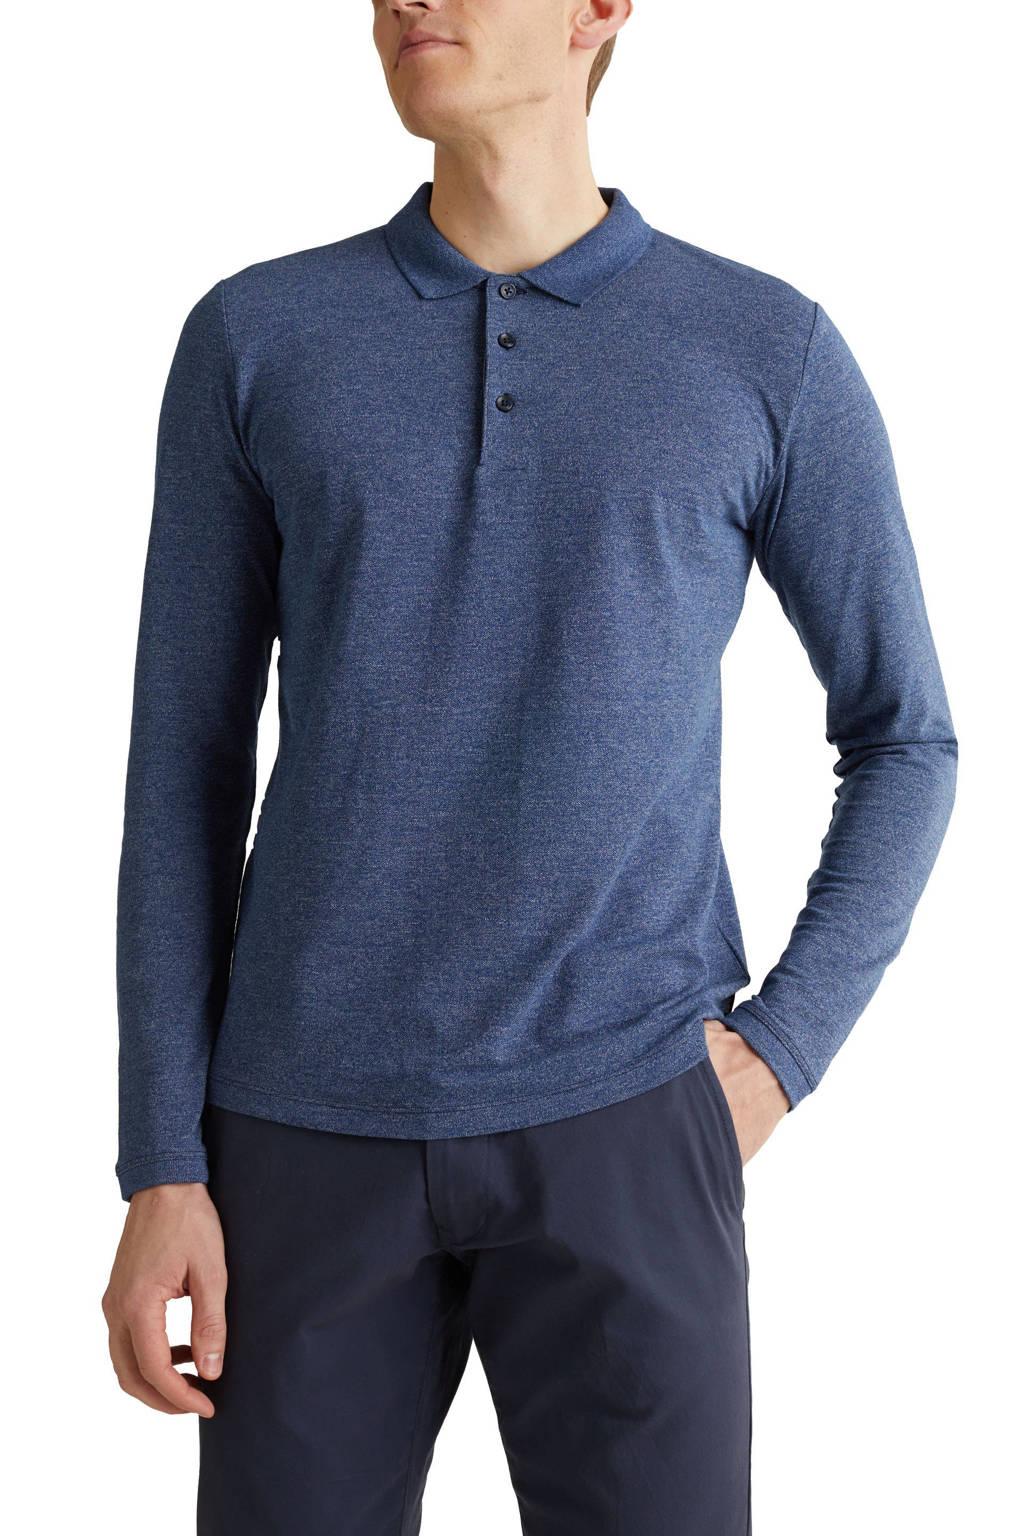 ESPRIT Men Casual gemêleerde regular fit polo blauw, Blauw